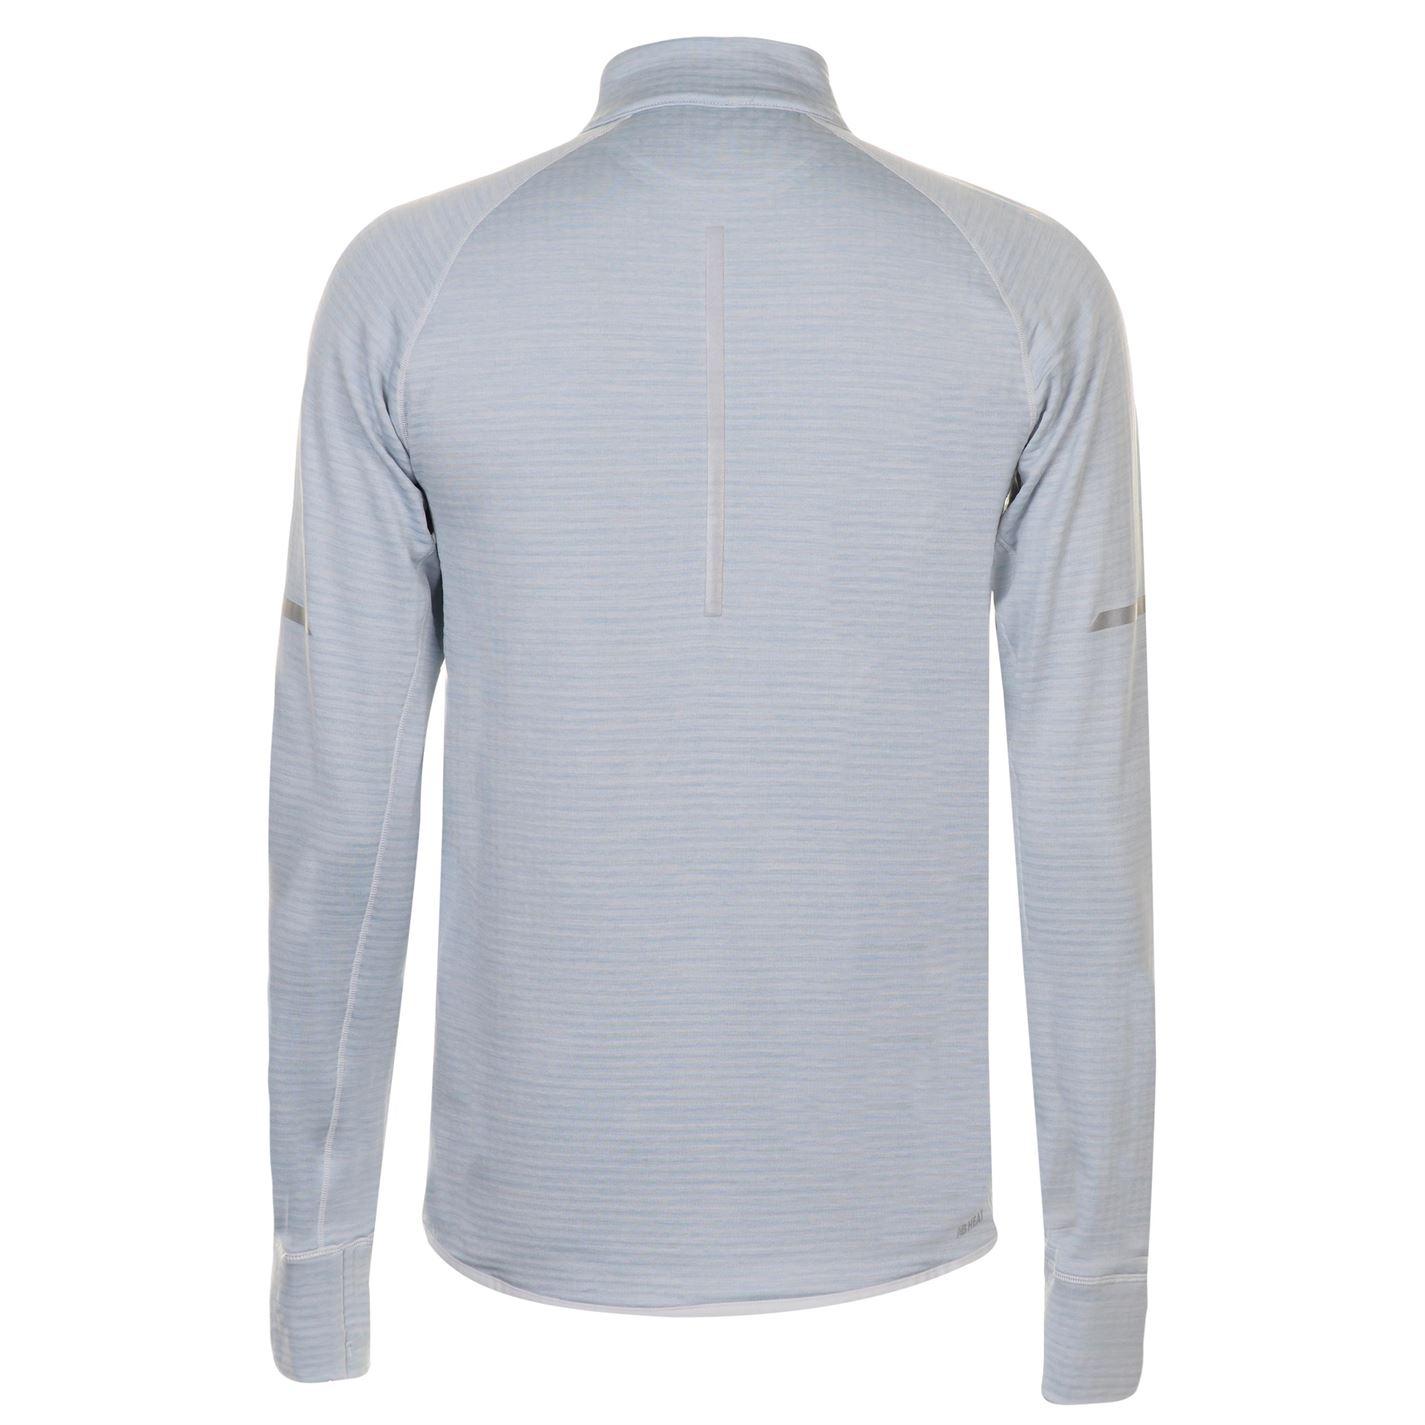 d7710c8ec6de5 New Balance Heat Half Zip Top Mens Gents Full Length Sleeve ...